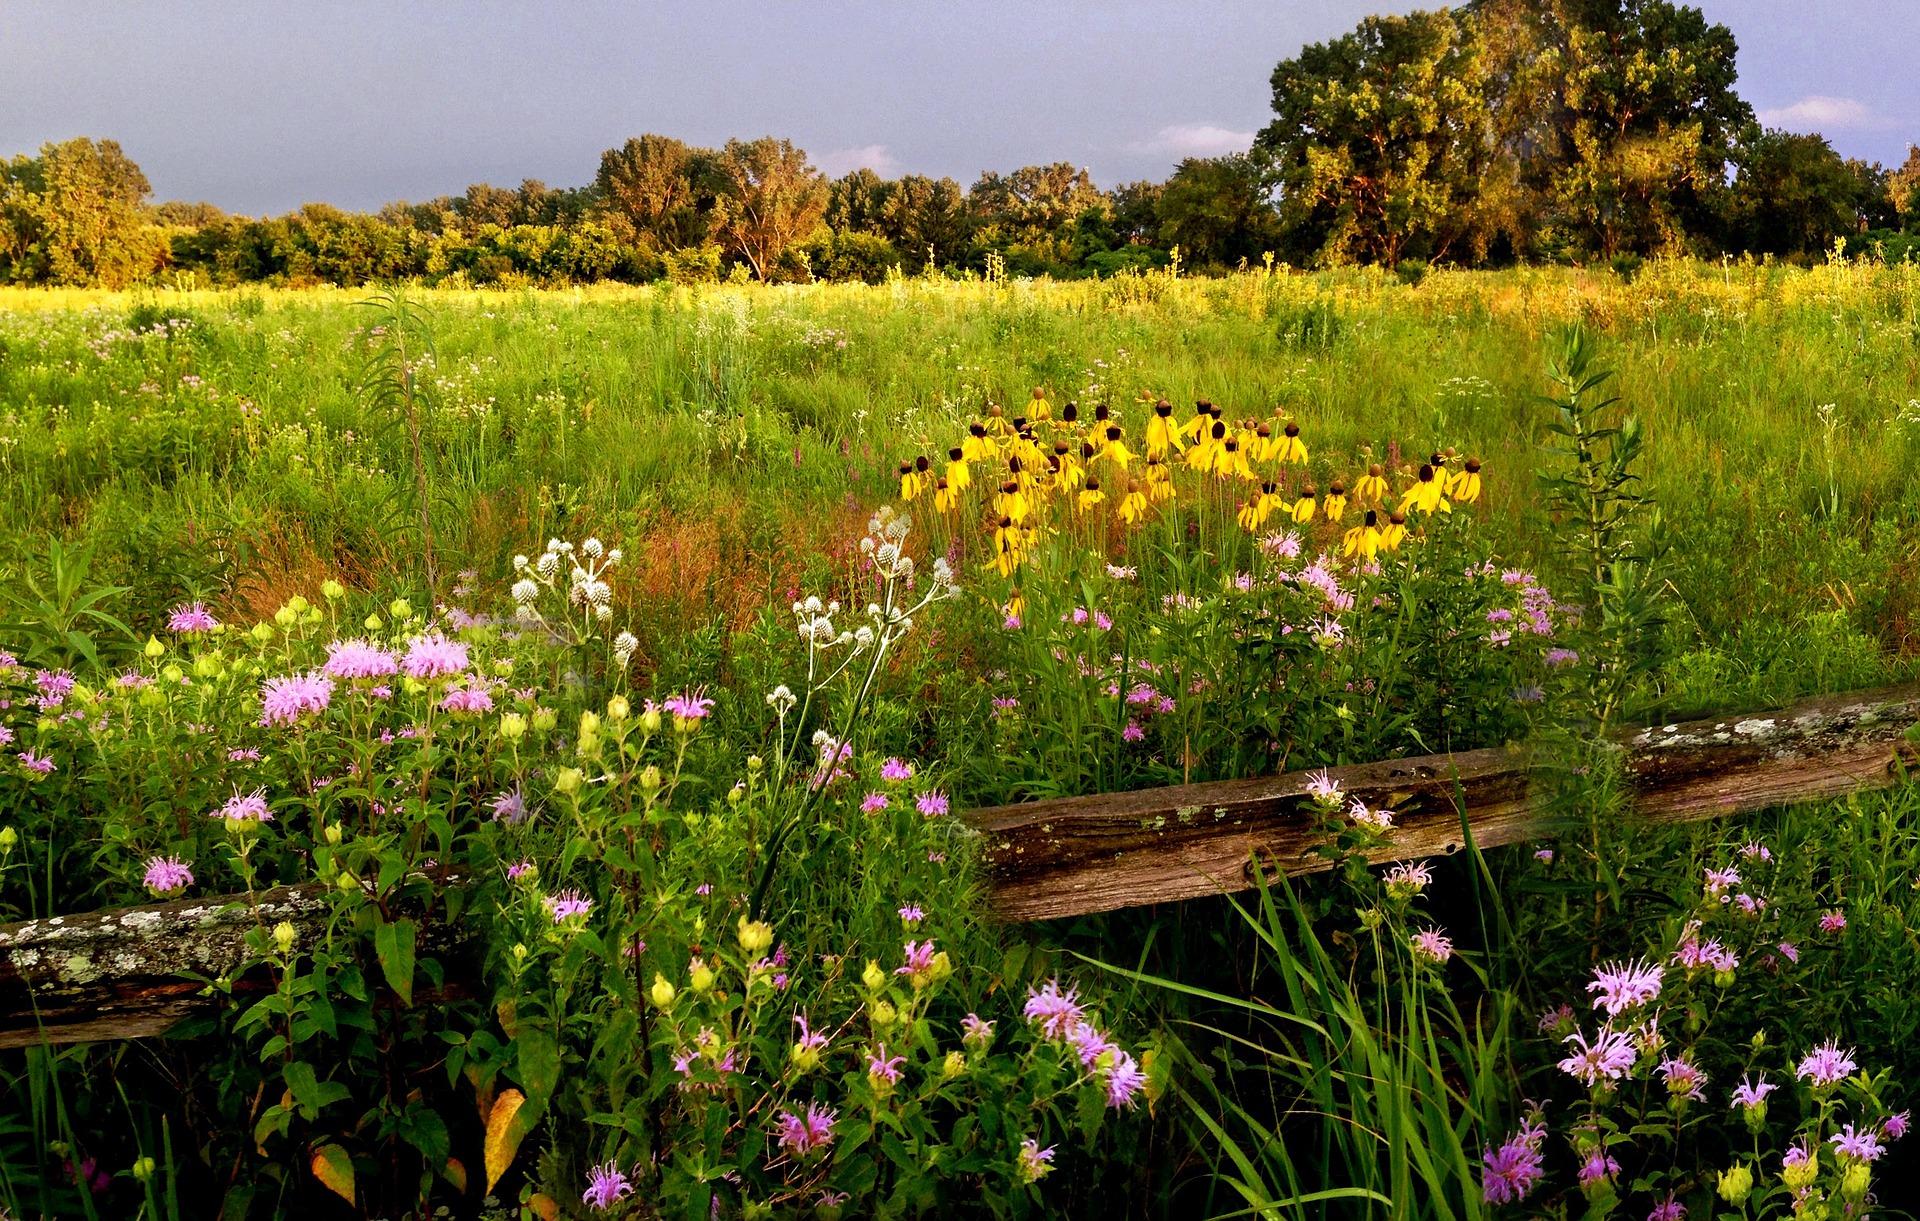 Native plant prairie wildflowers.